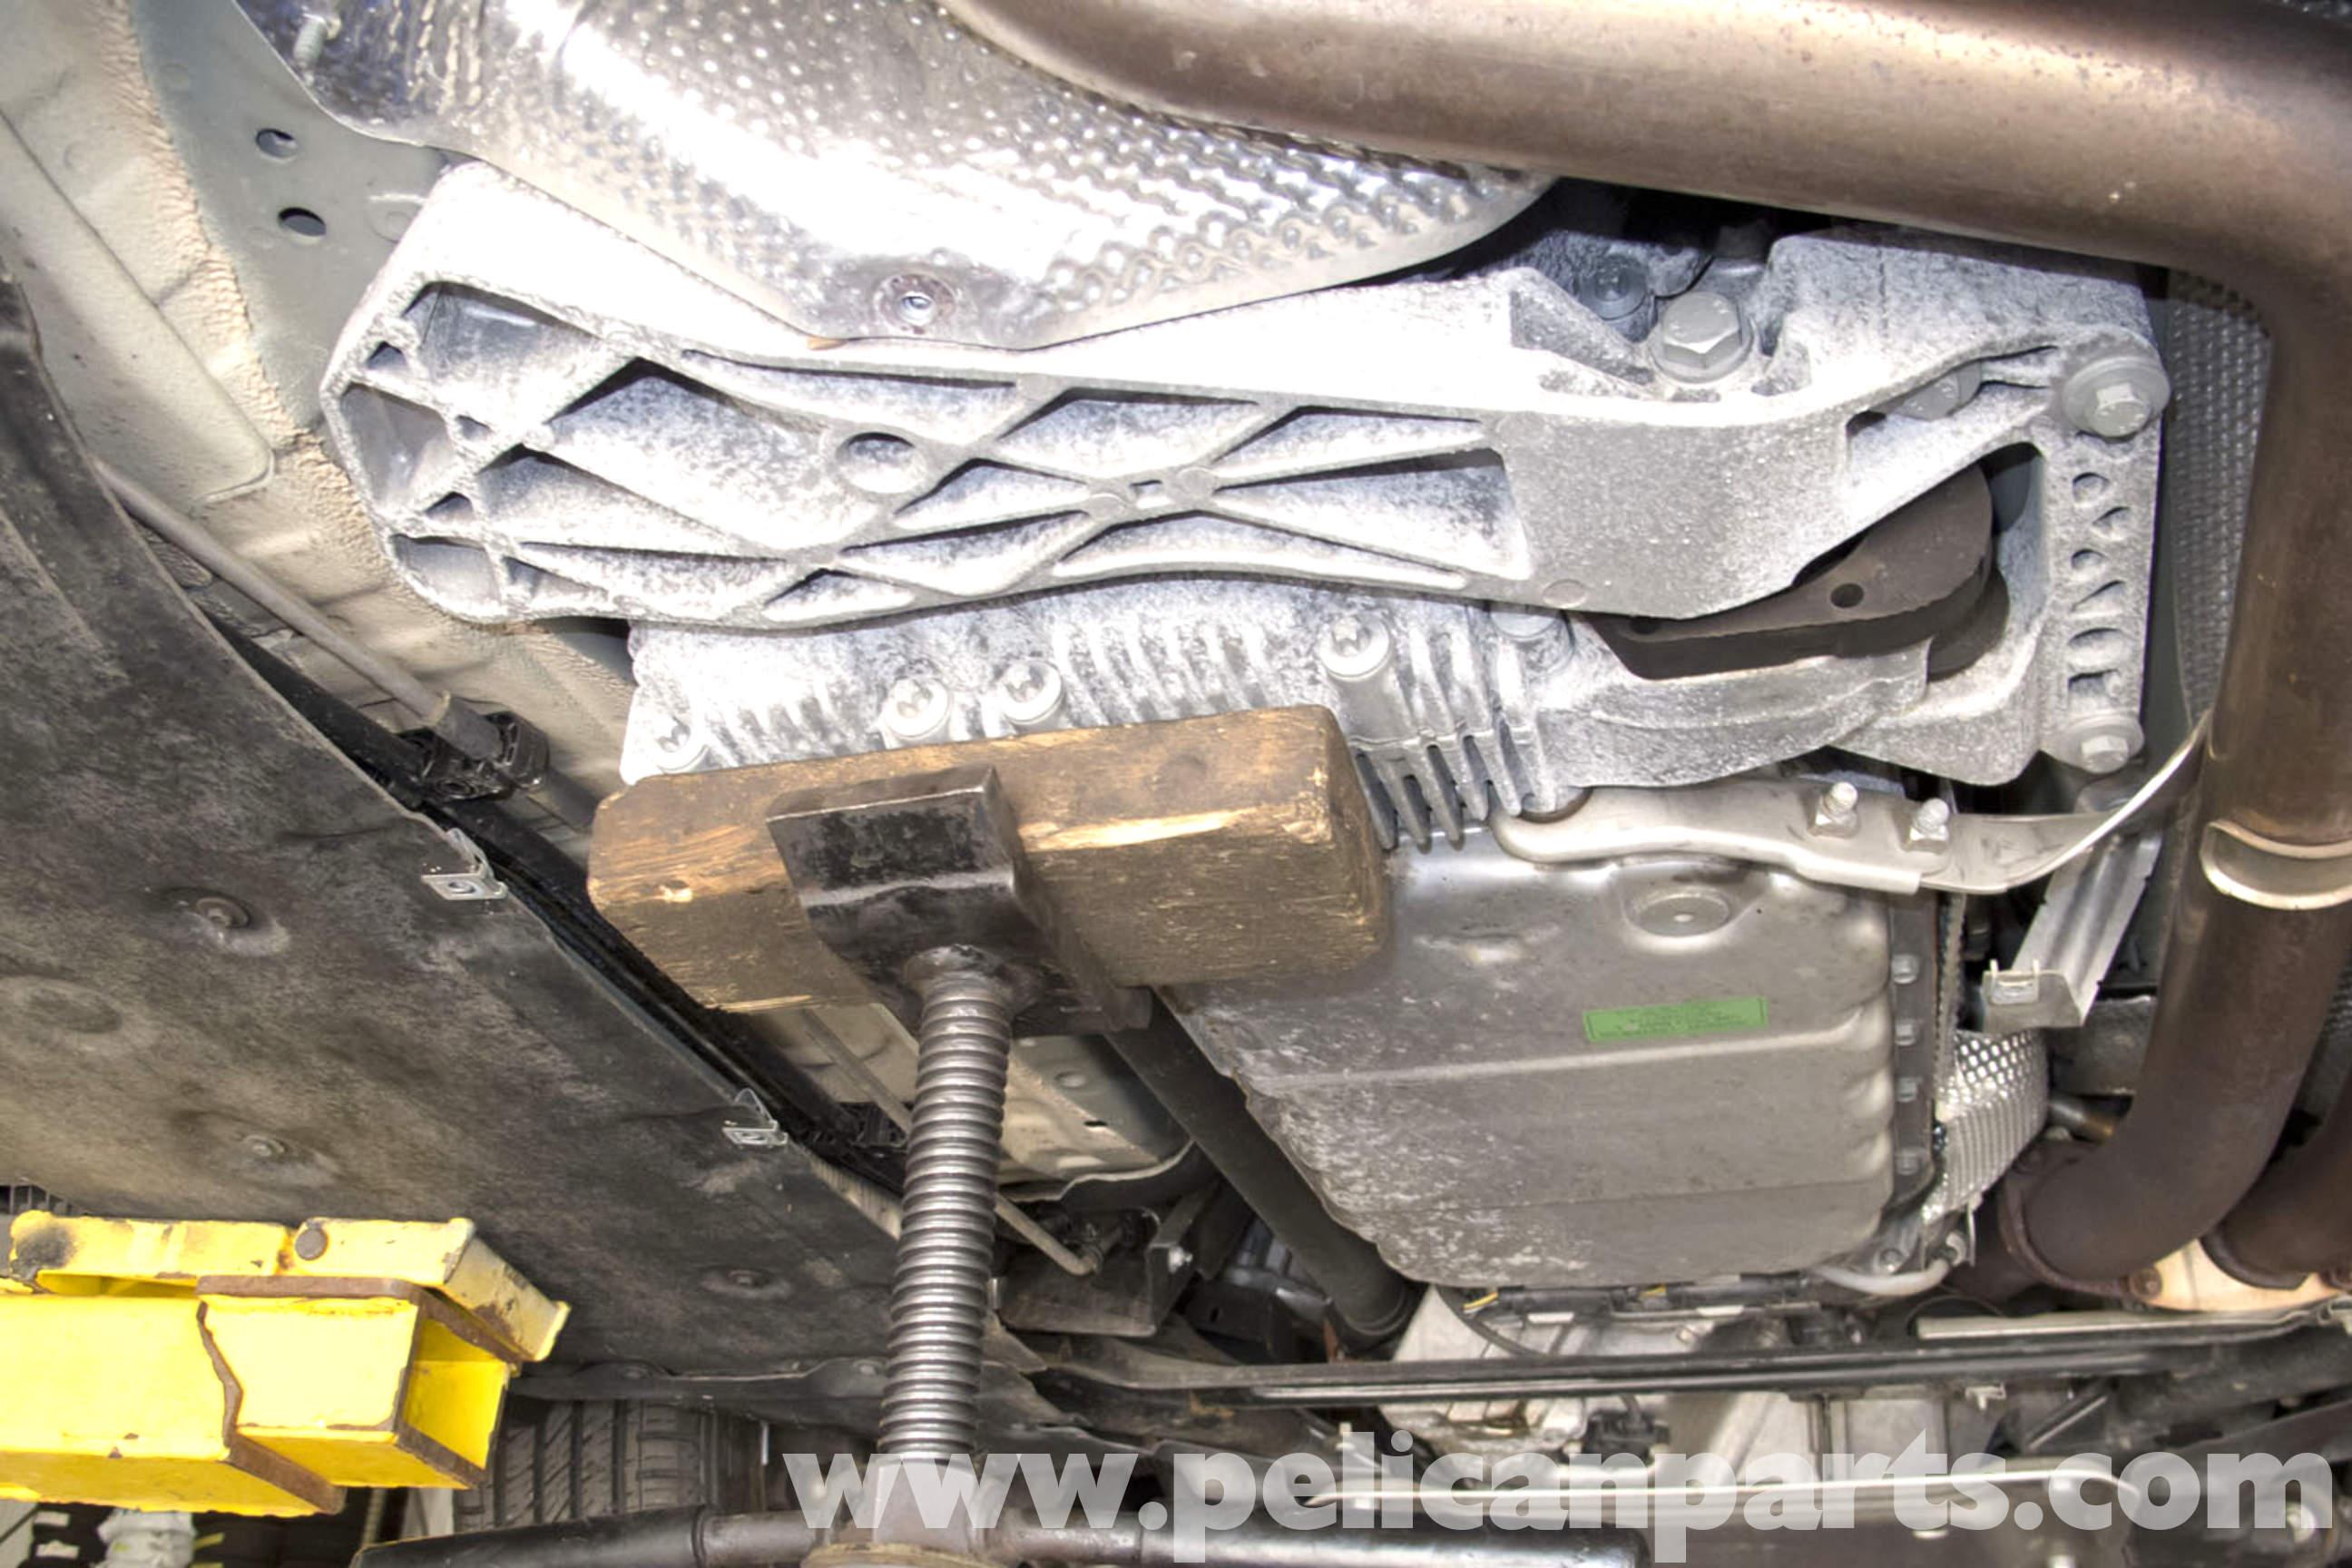 BMW E90 Transfer Case Fluid Replacement | E91, E92, E93